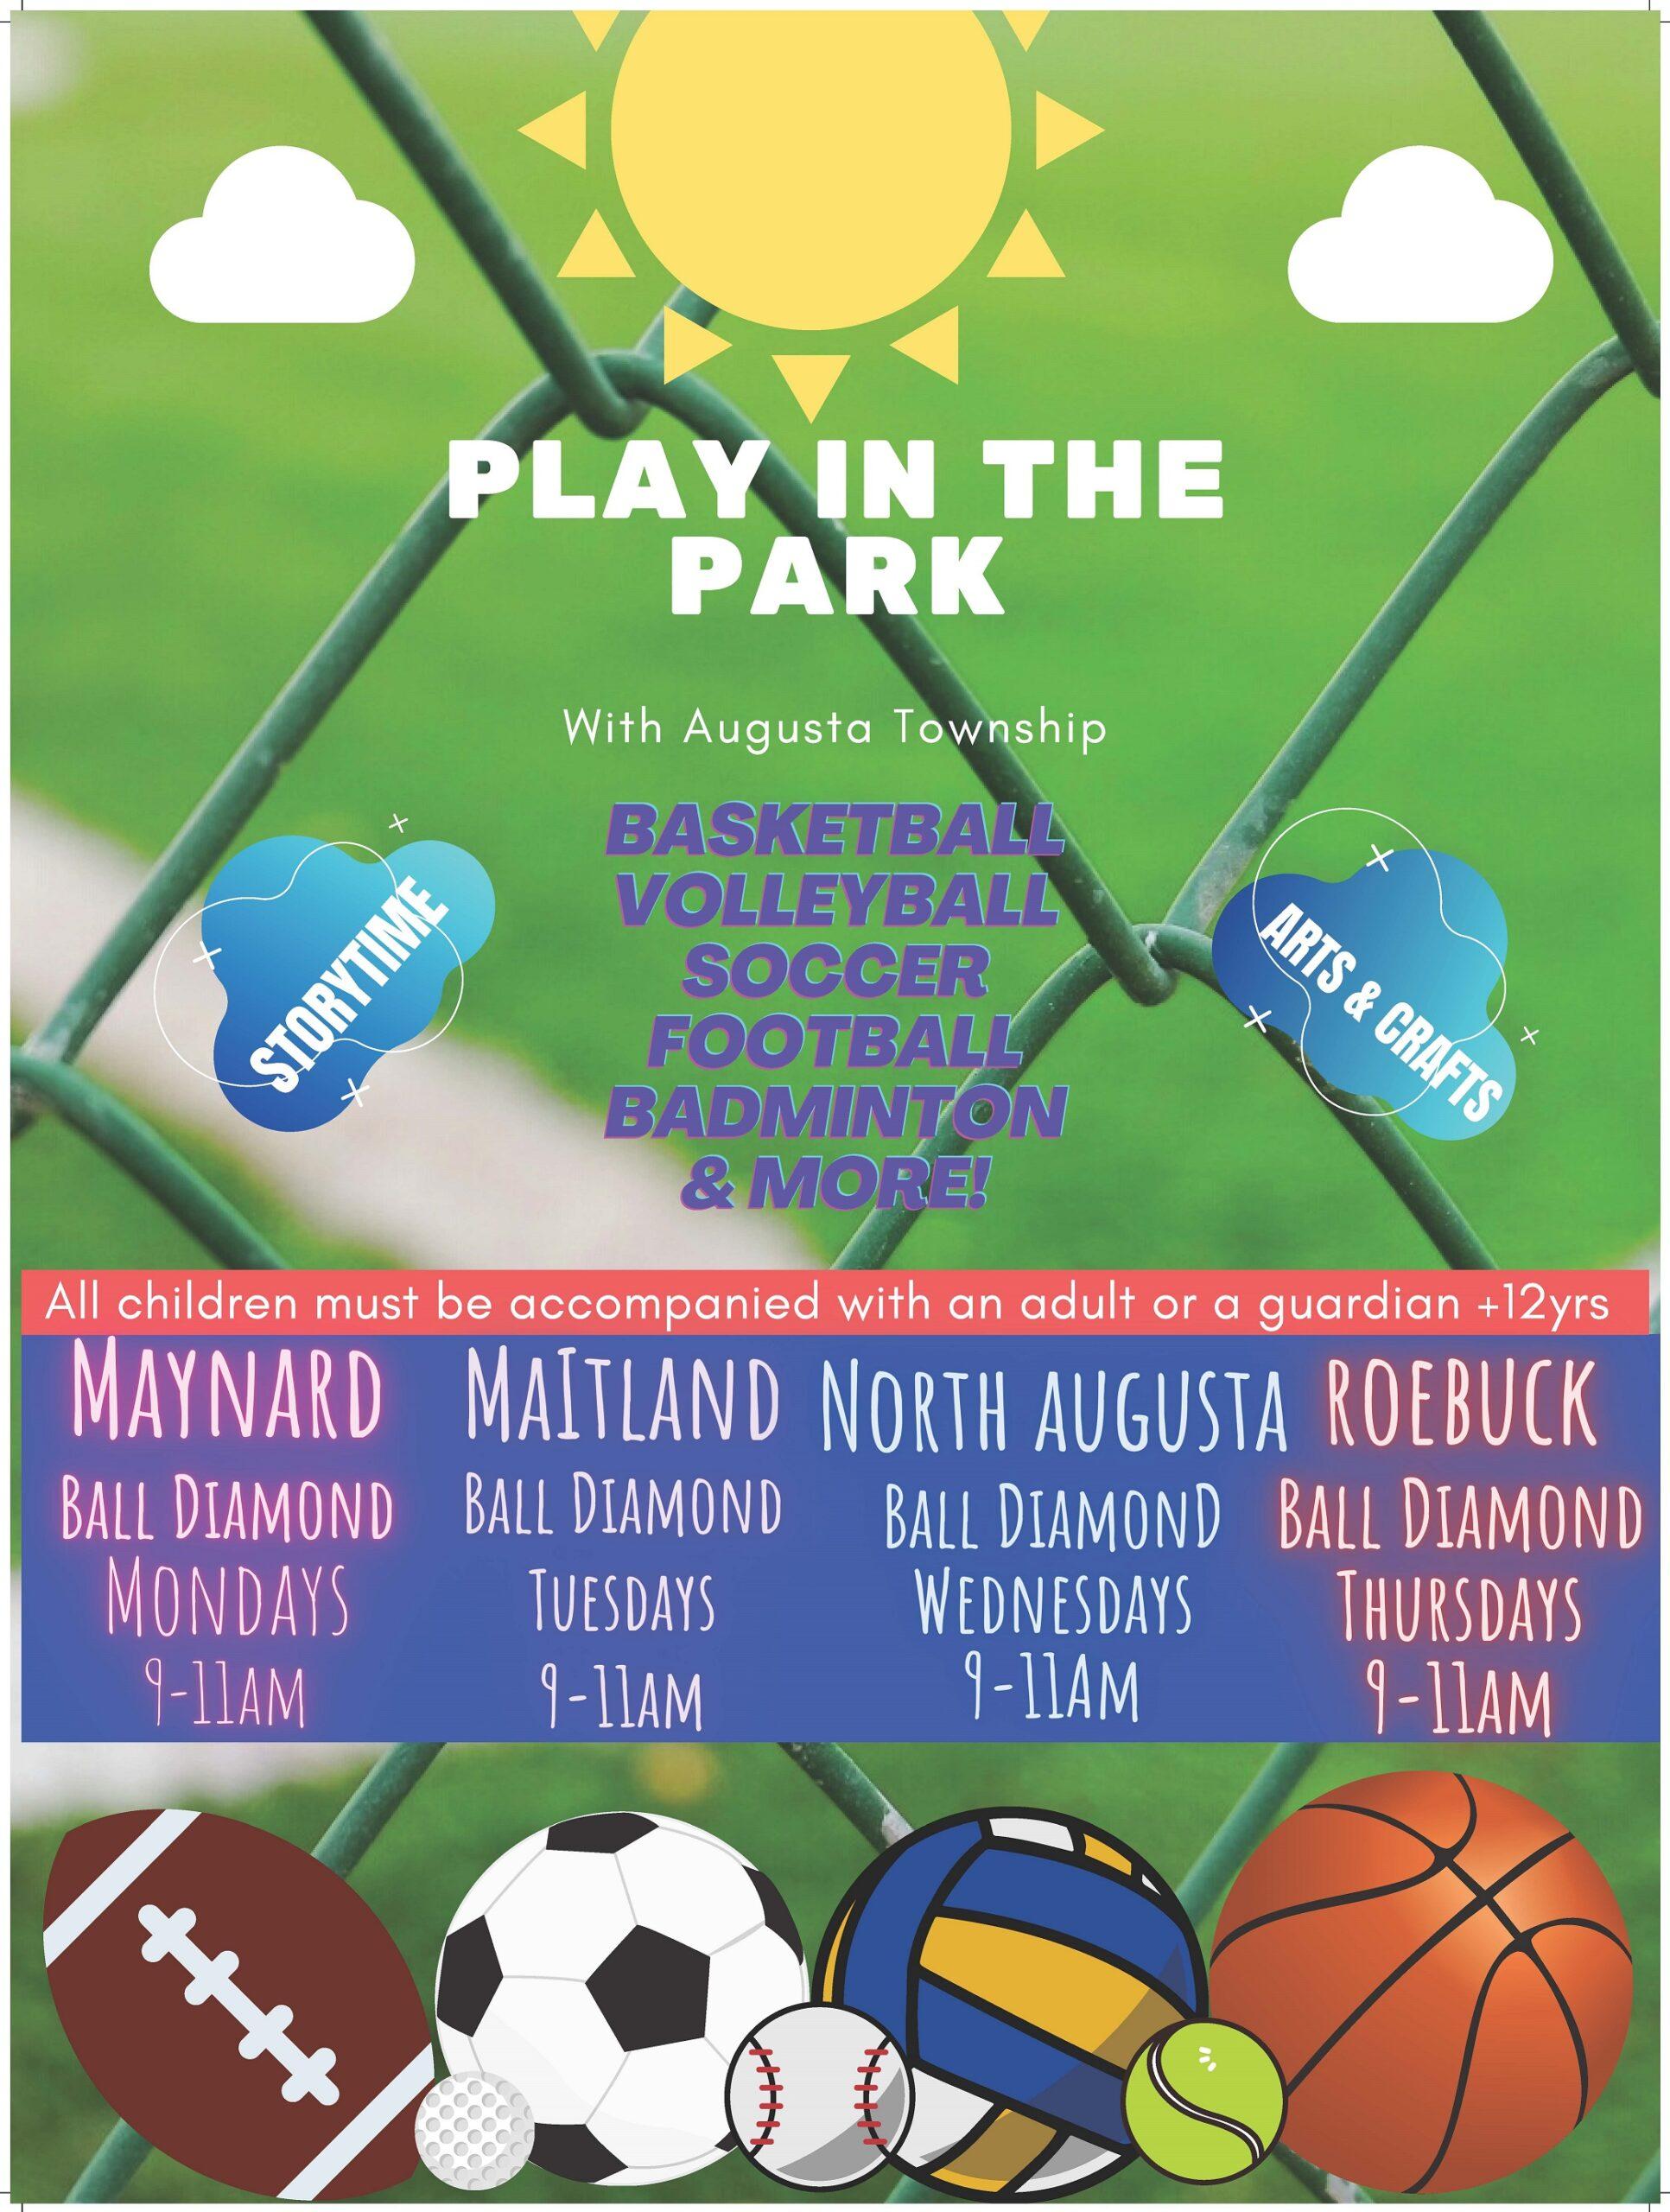 Play in the Park (Maynard) @ Maynard Ball Diamond | Ontario | Canada